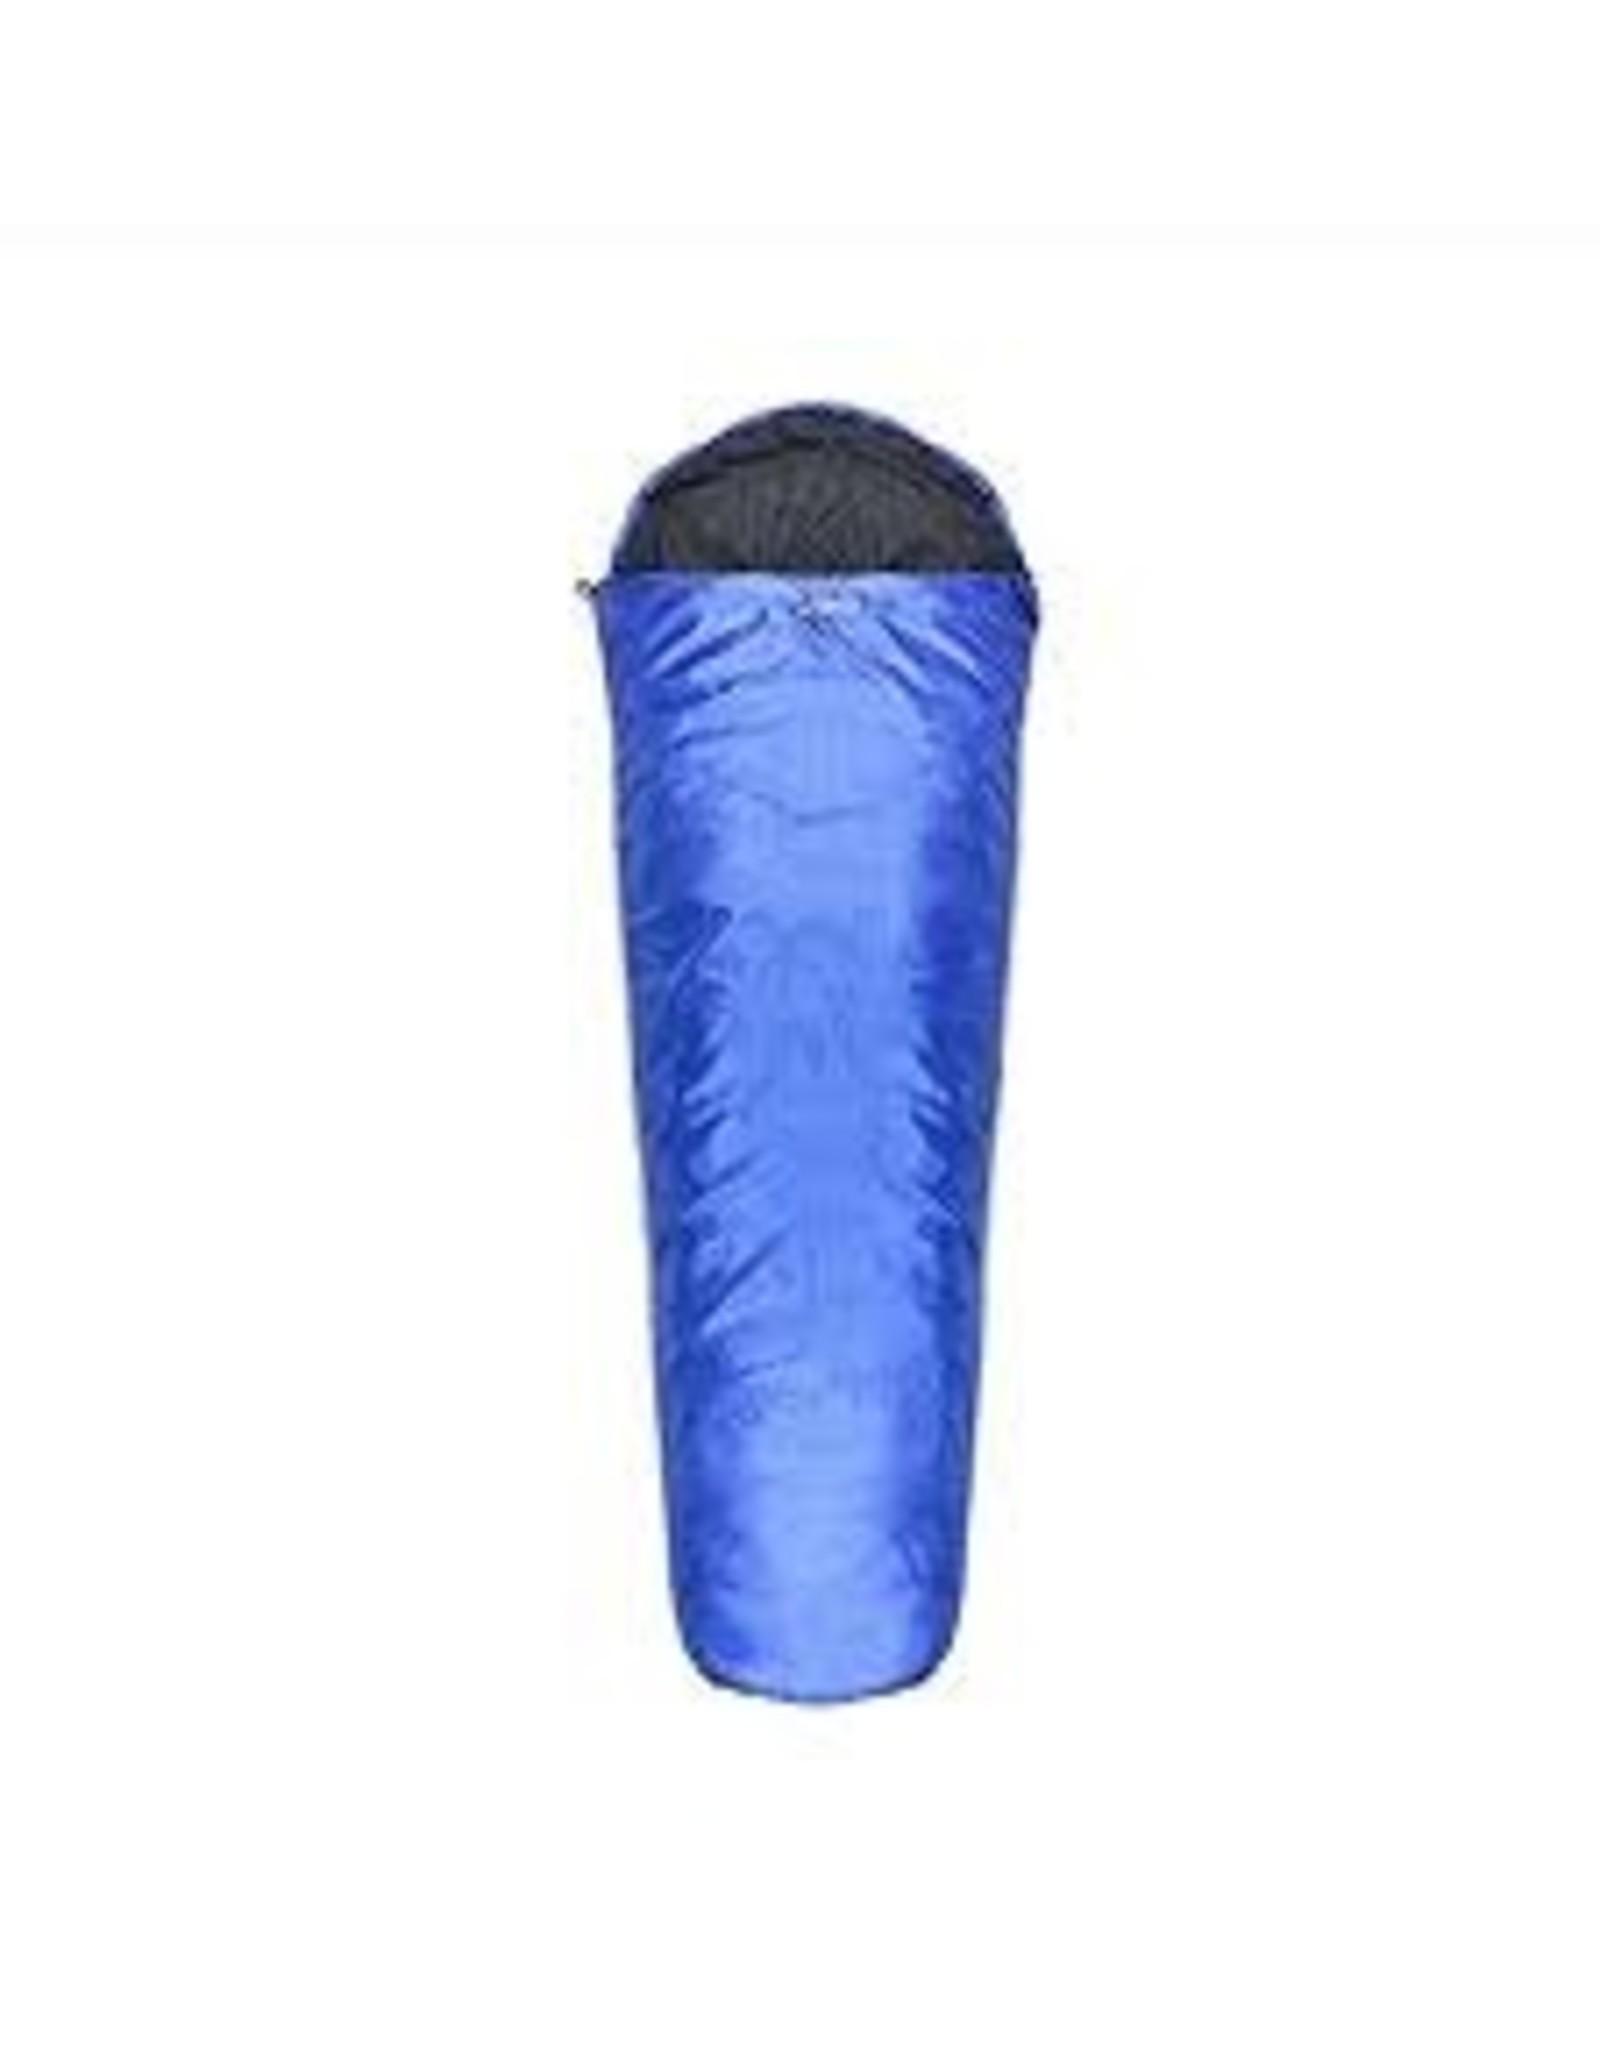 Chinook Chinook THERMOPALM MUMMY 32F (BLUE) Sleeping Bag